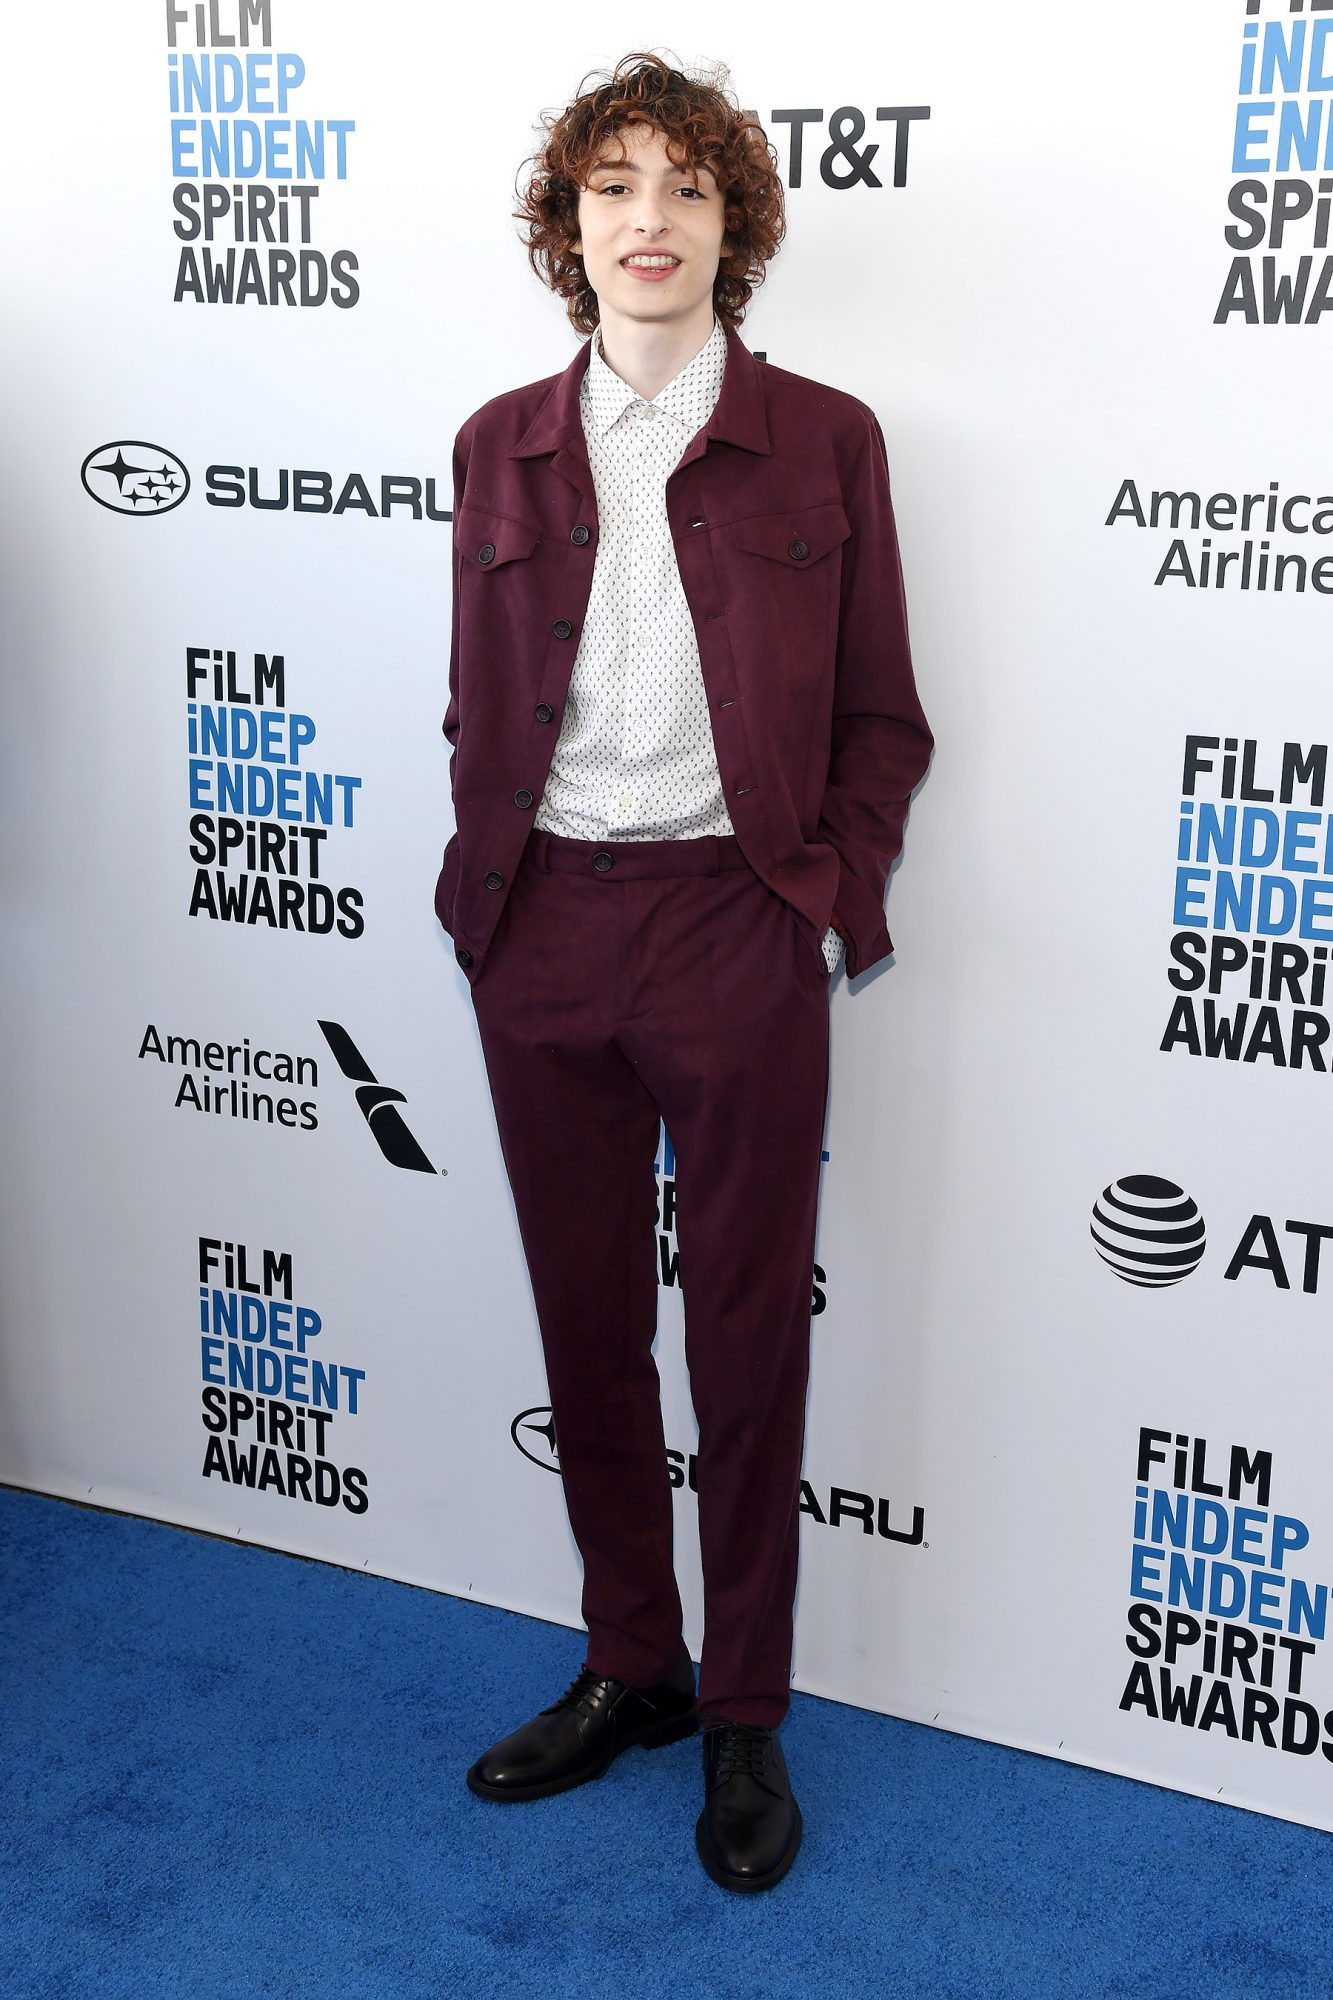 2019 Film Independent Spirit Awards  - Red Carpet